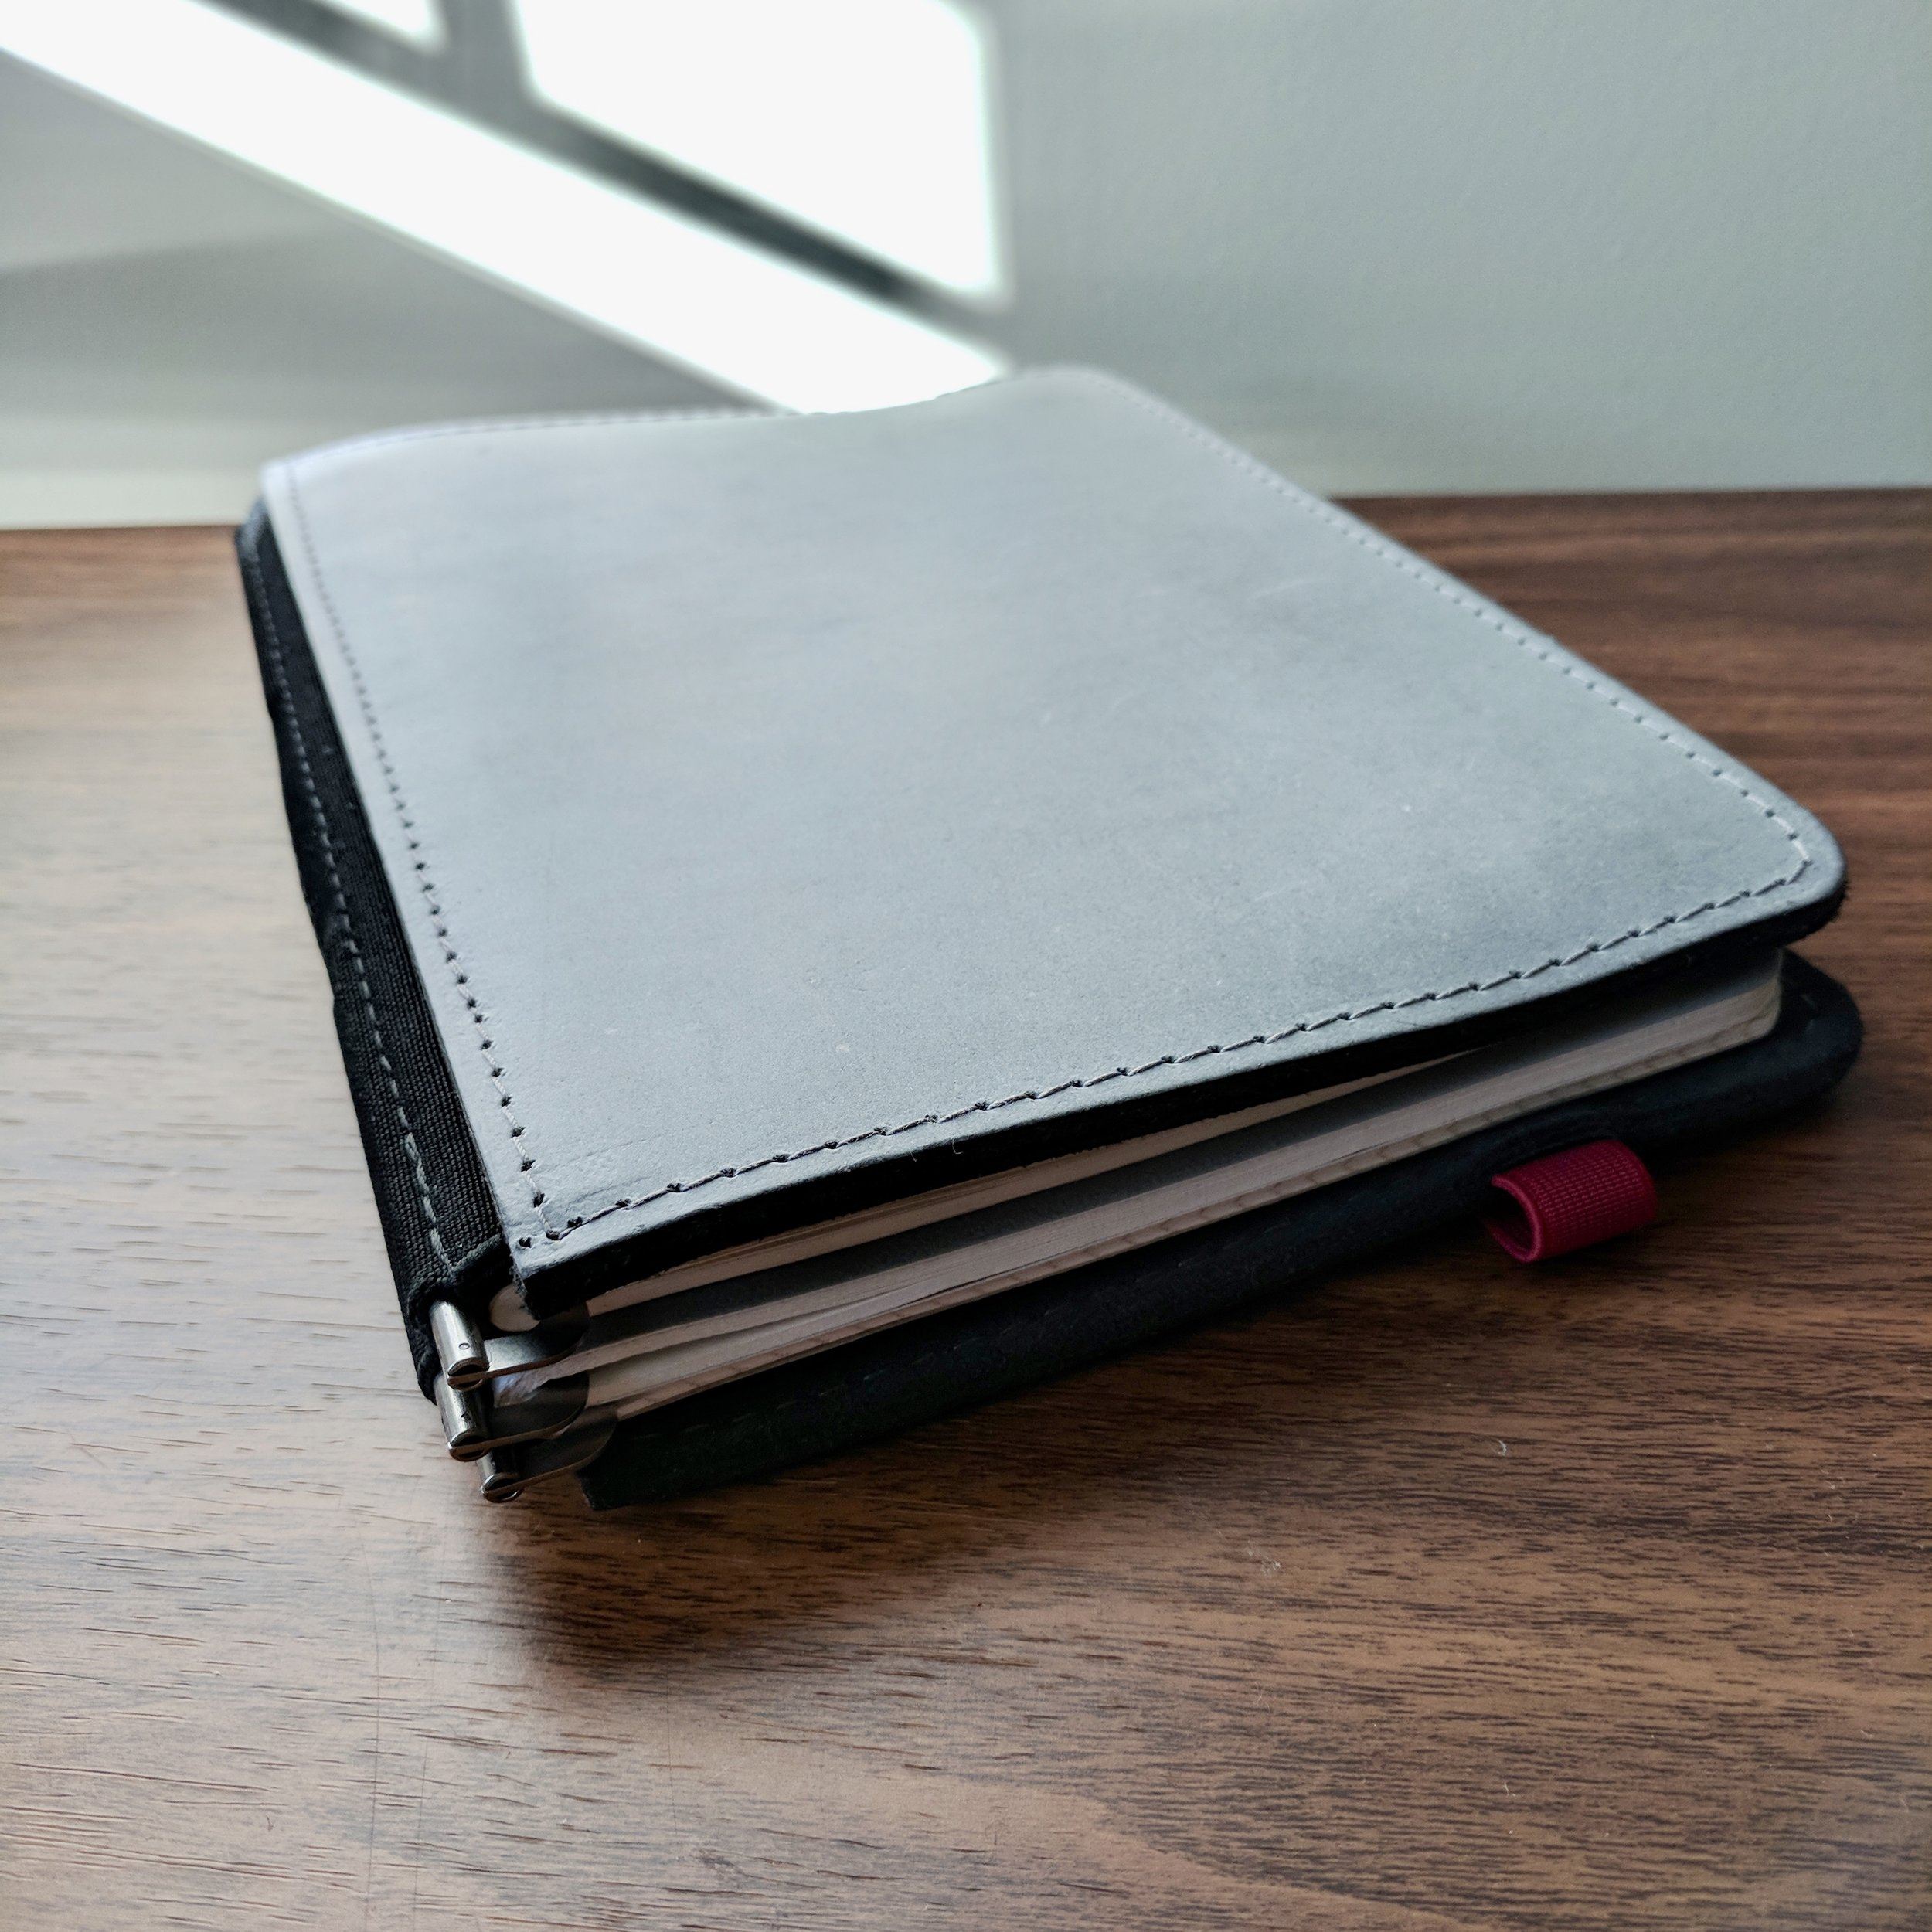 Roterfaden Taschenbegleiter with Single Subject A5 Notebooks